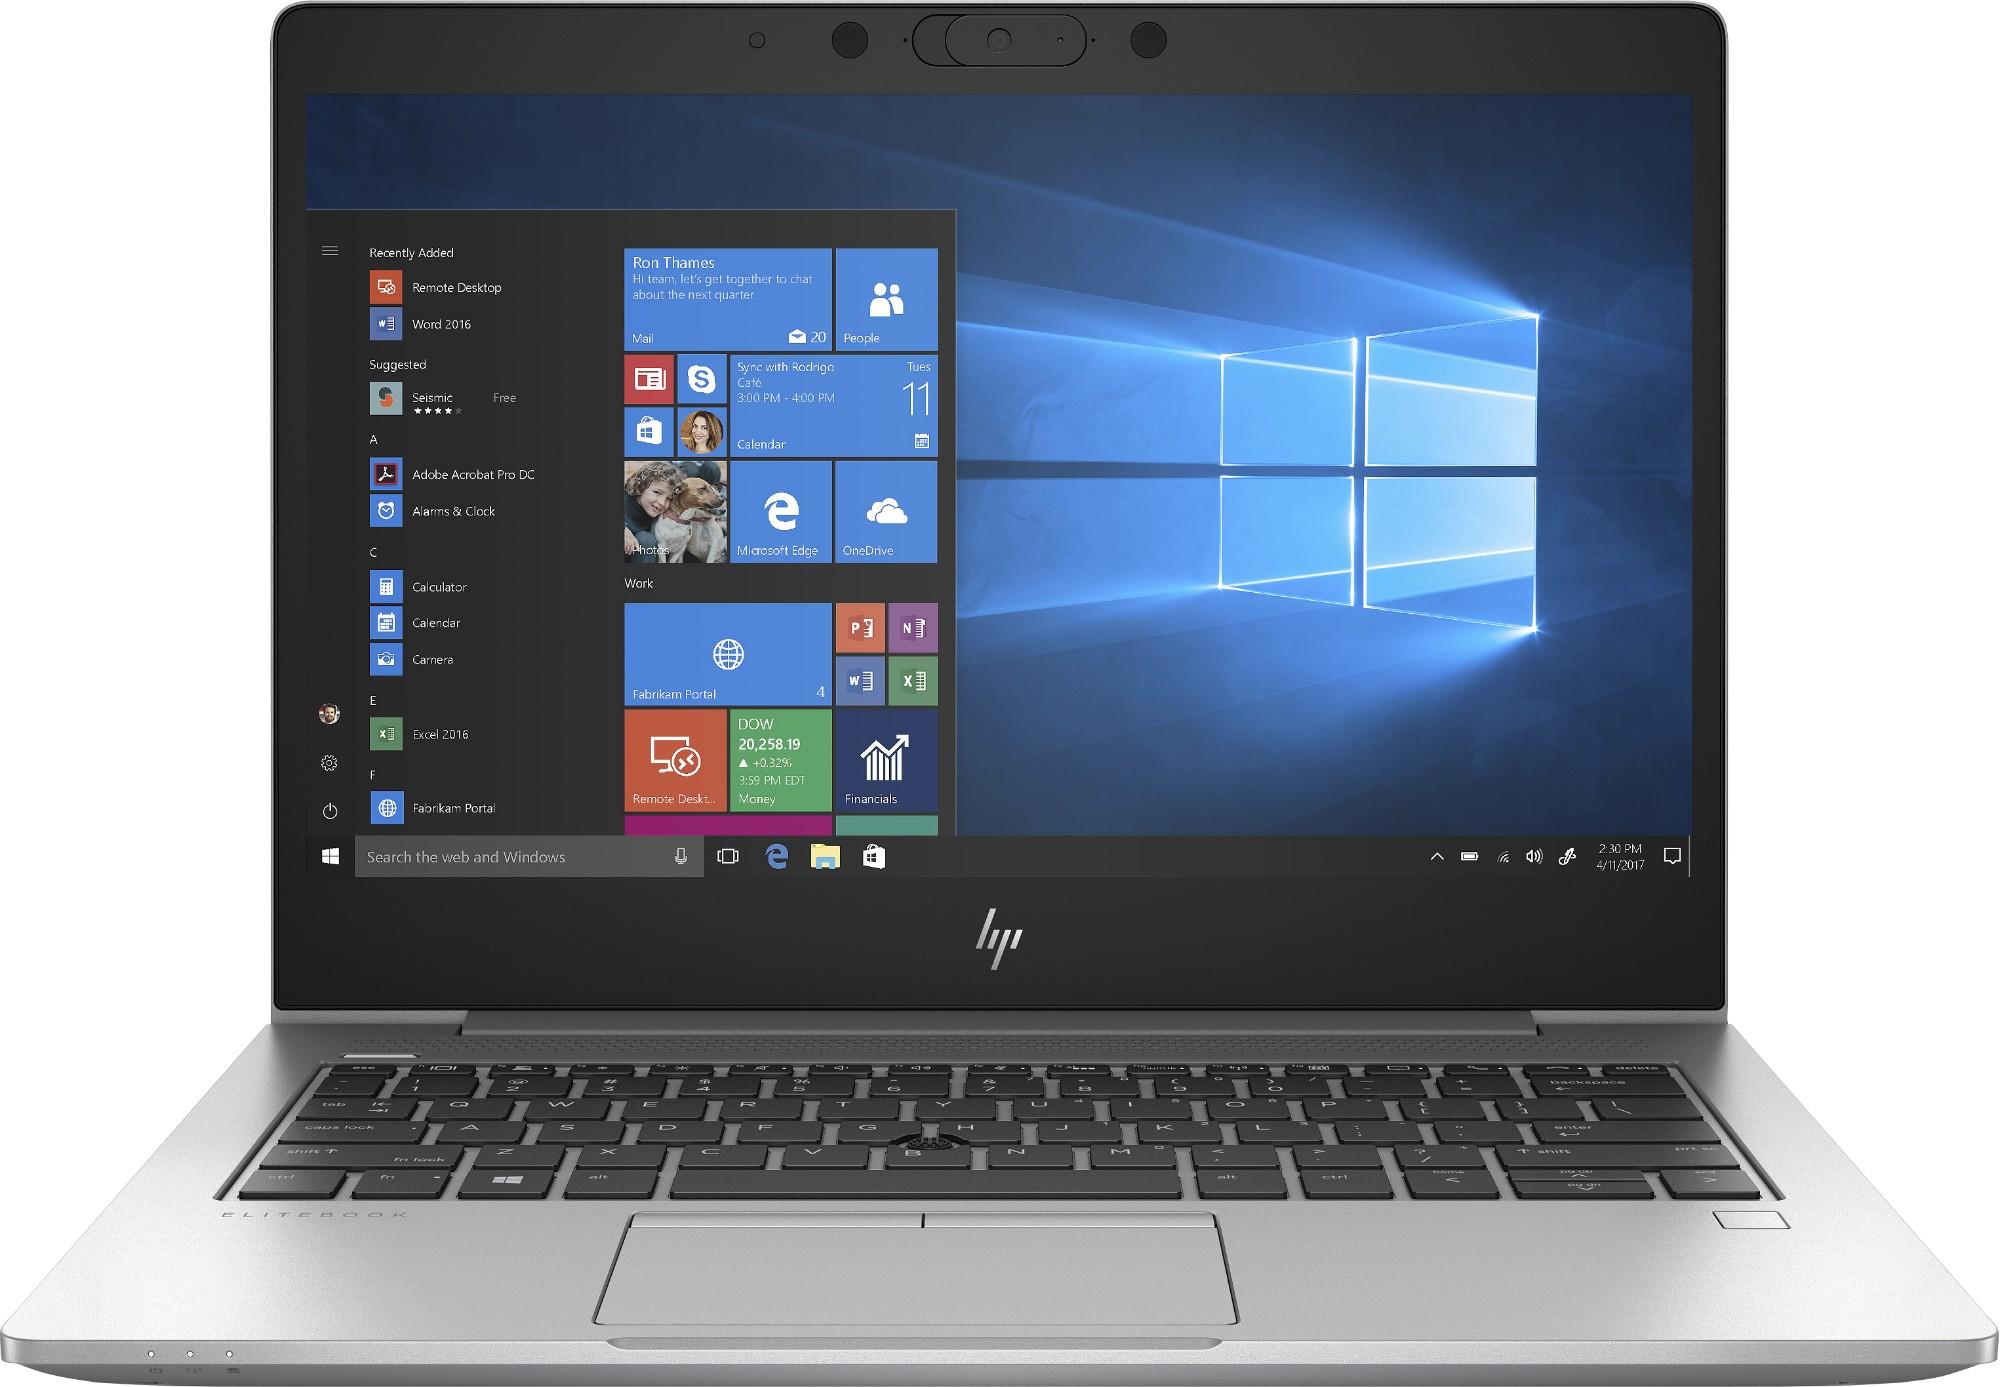 "HP EliteBook 735 G6 Portátil Plata 33,8 cm (13.3"") 1920 x 1080 Pixeles Pantalla táctil AMD Ryzen 5 PRO 8 GB DDR4-SDRAM 512 GB SSD Wi-Fi 5 (802.11ac) Windows 10 Pro"